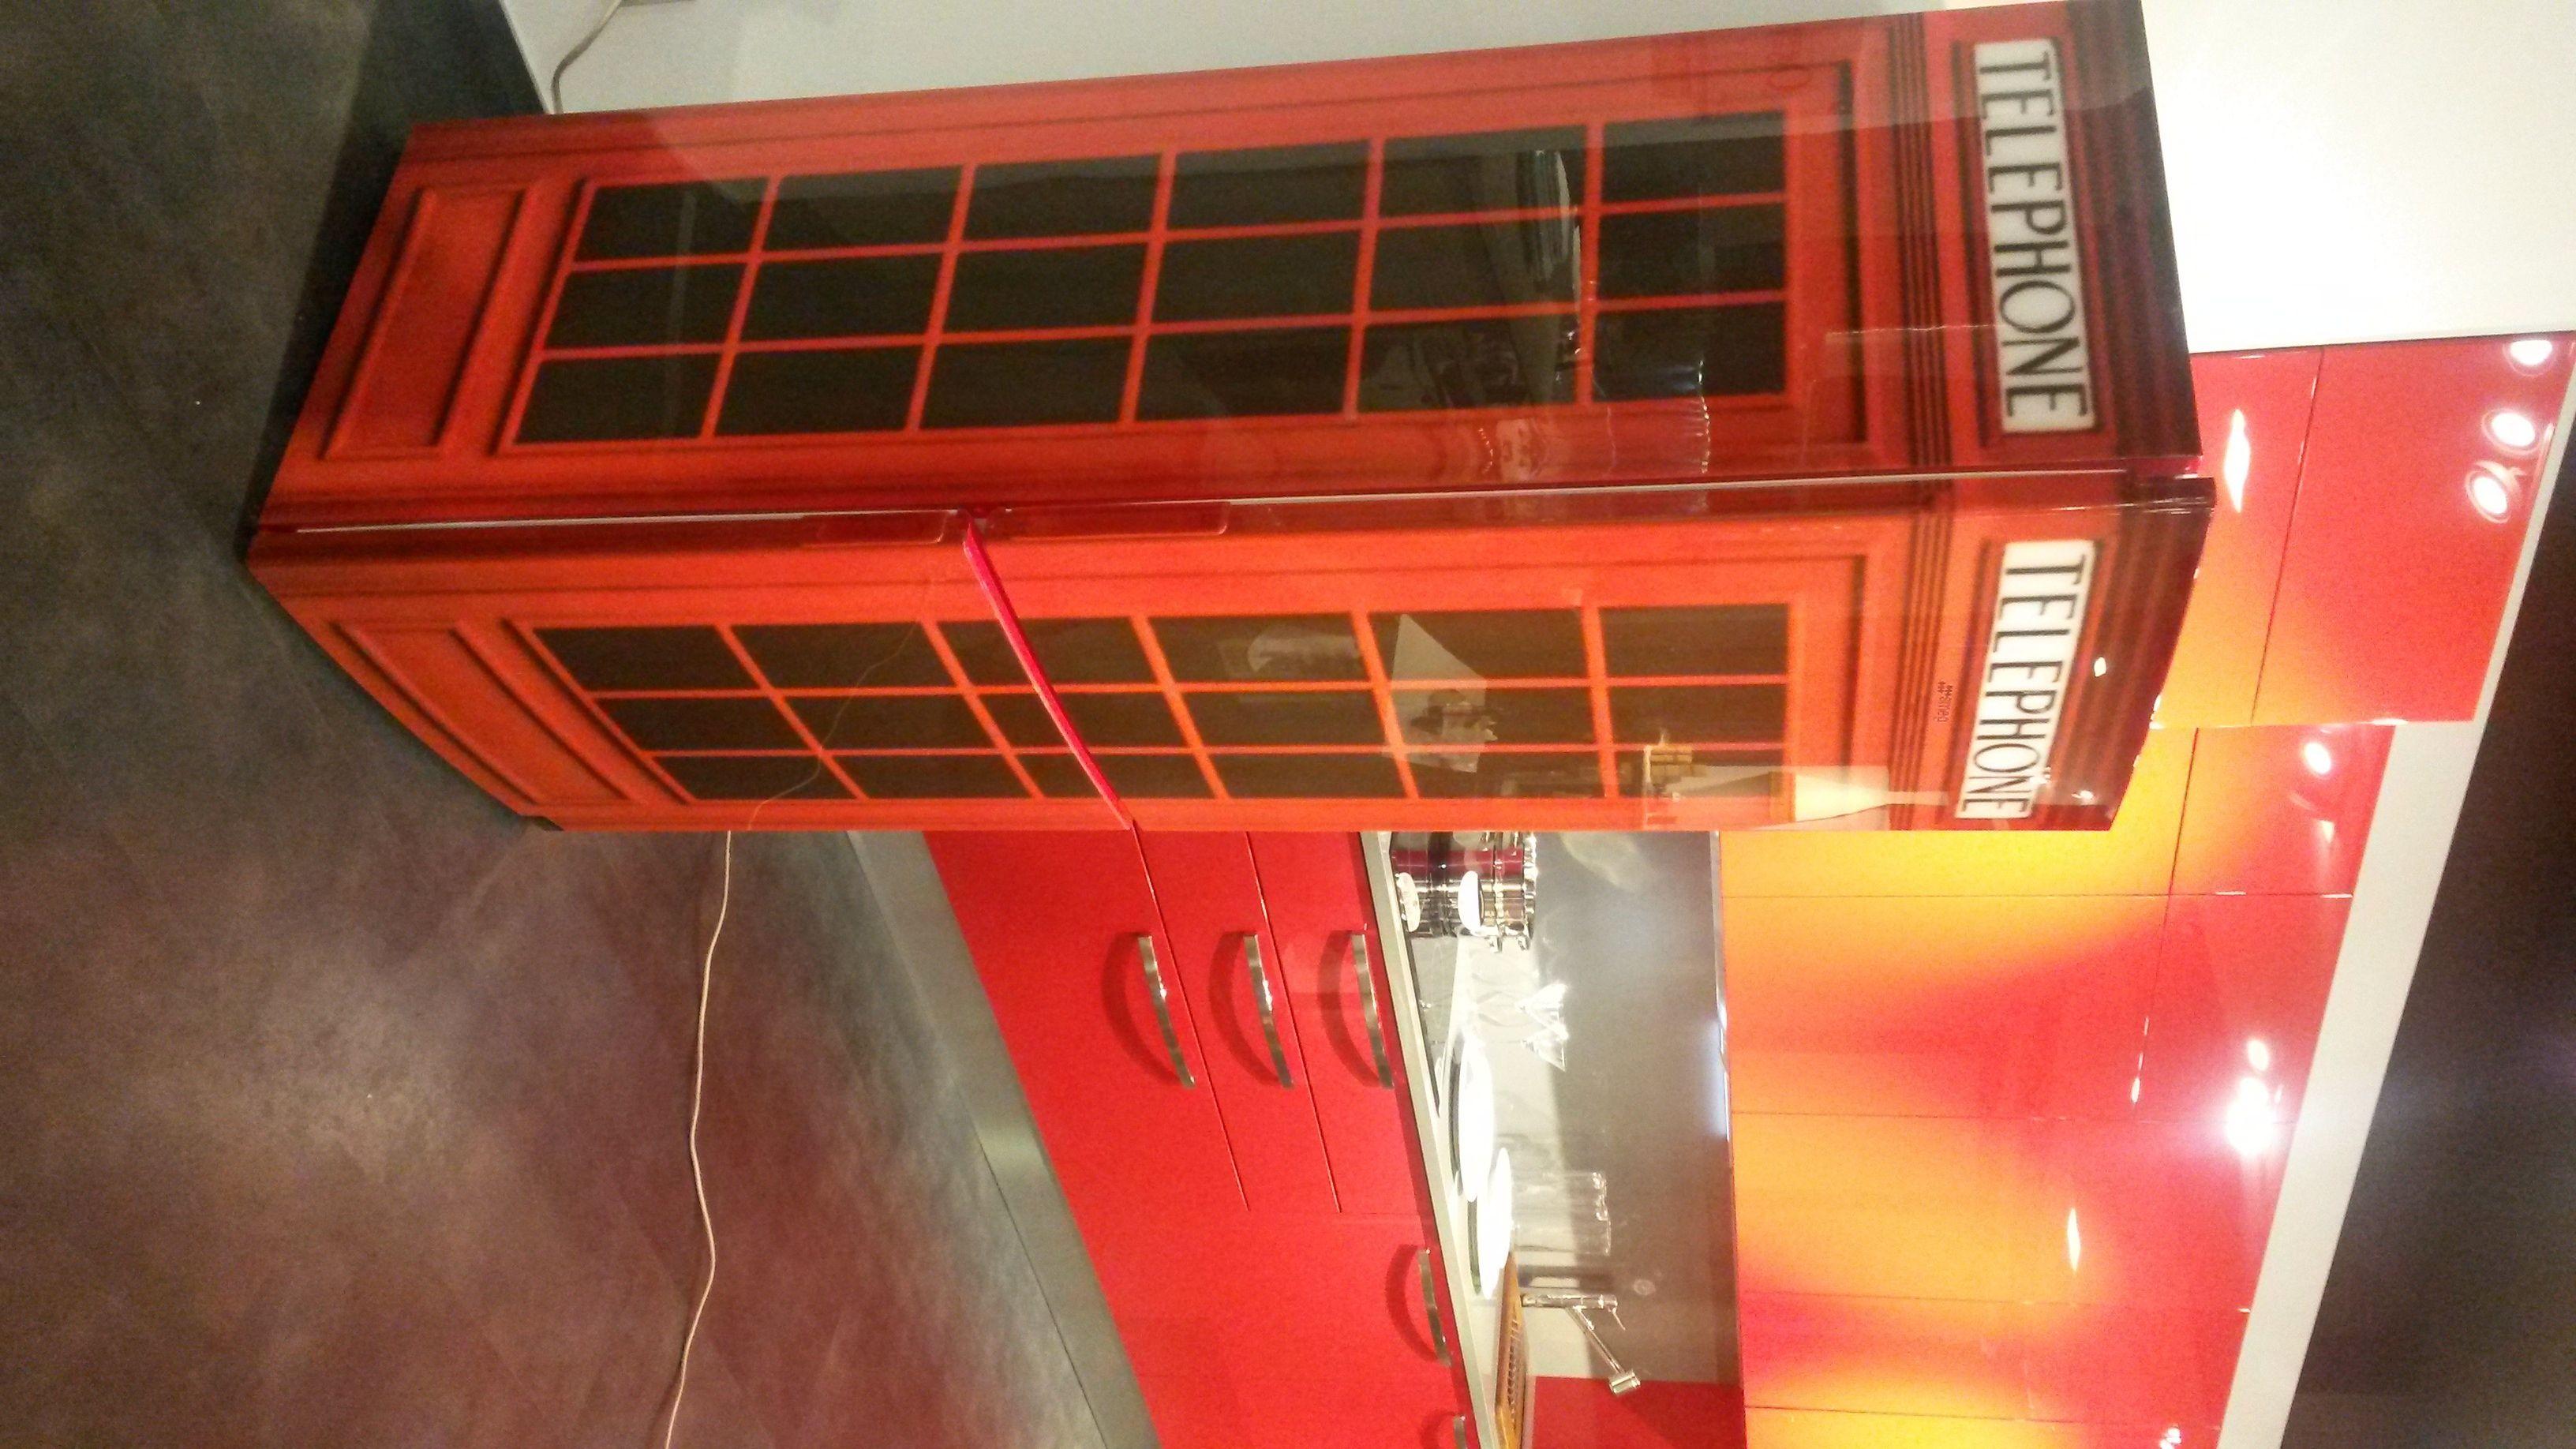 Frigorifero cabina telefonica inglese frigorifero for Cabina telefonica inglese arredamento